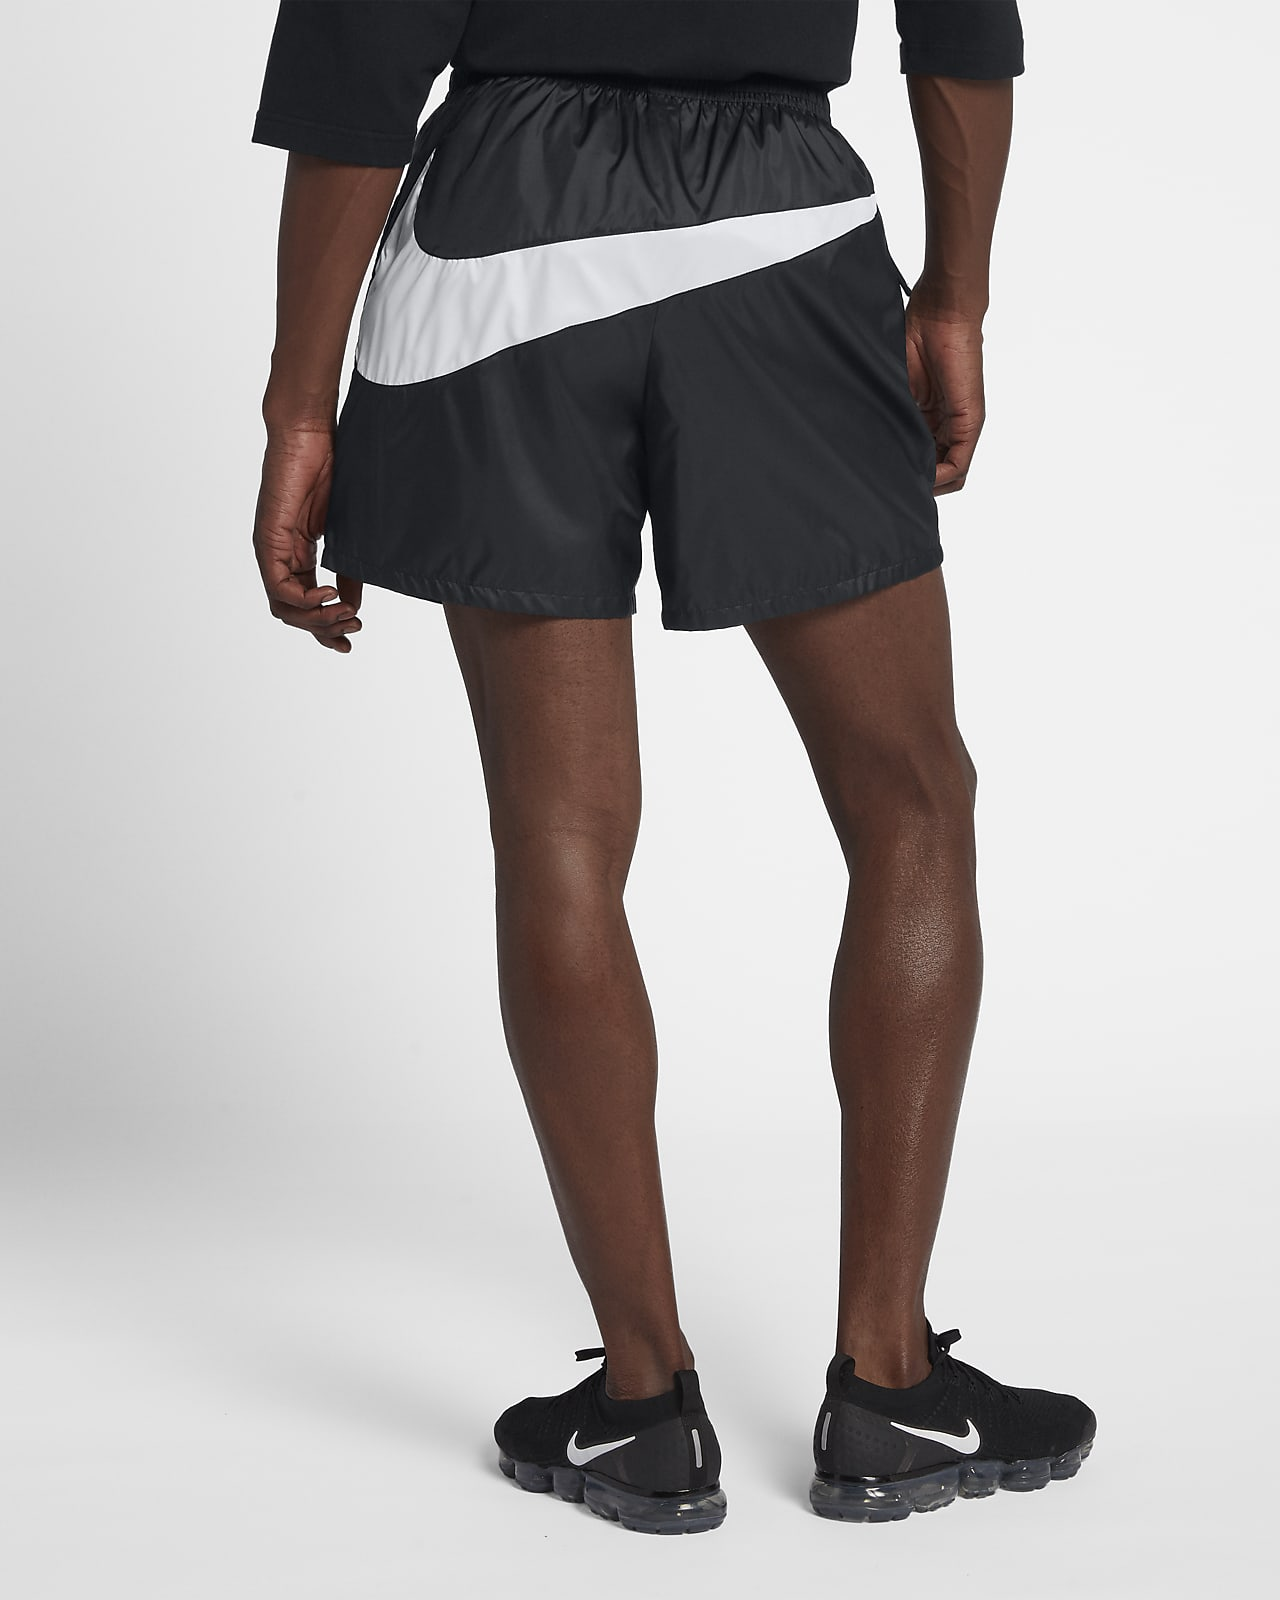 NikeLab Collection Heritage Shorts